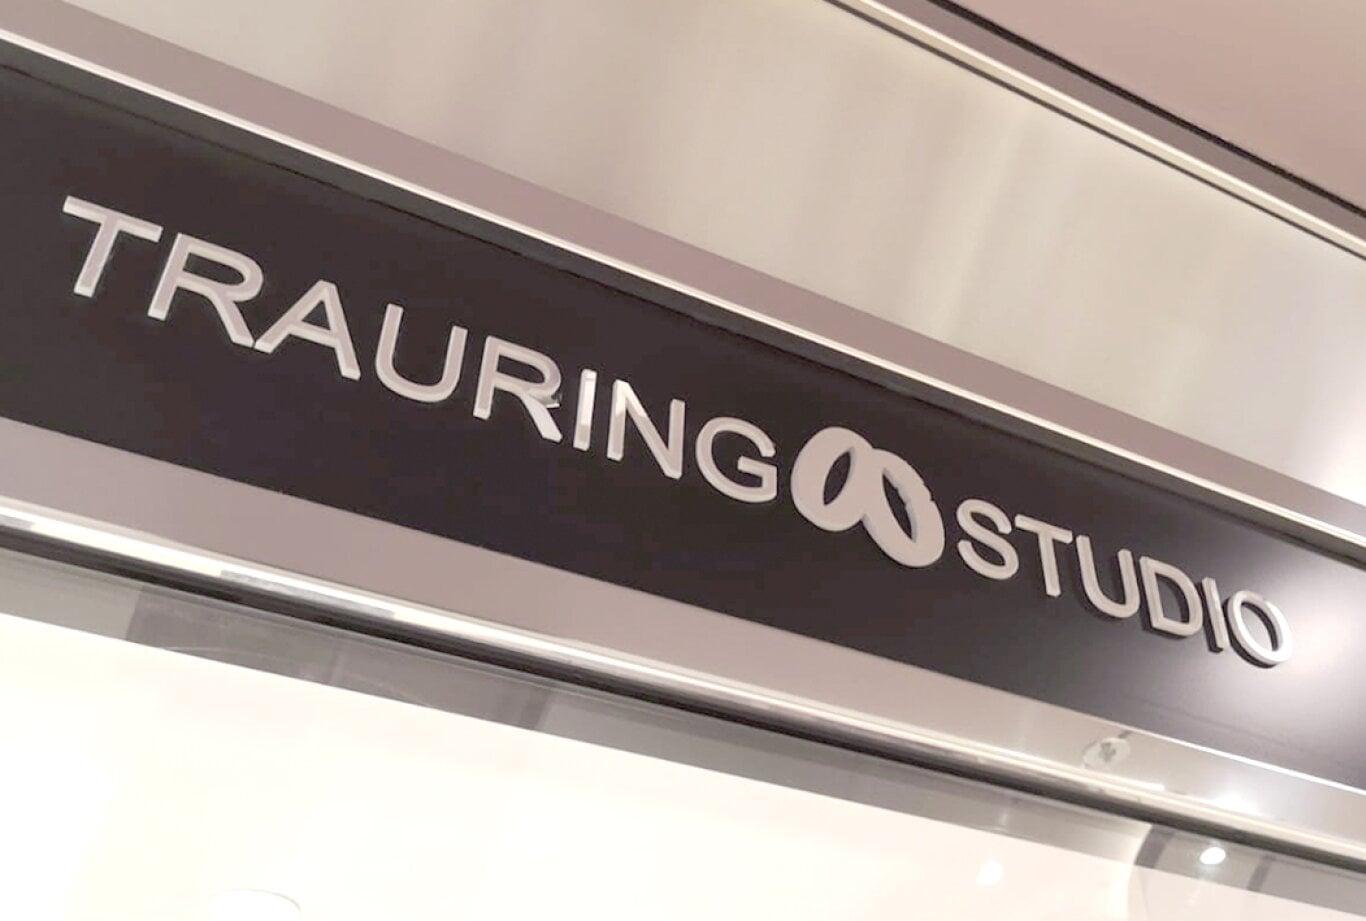 Hamburg_2_Ab2kIGA